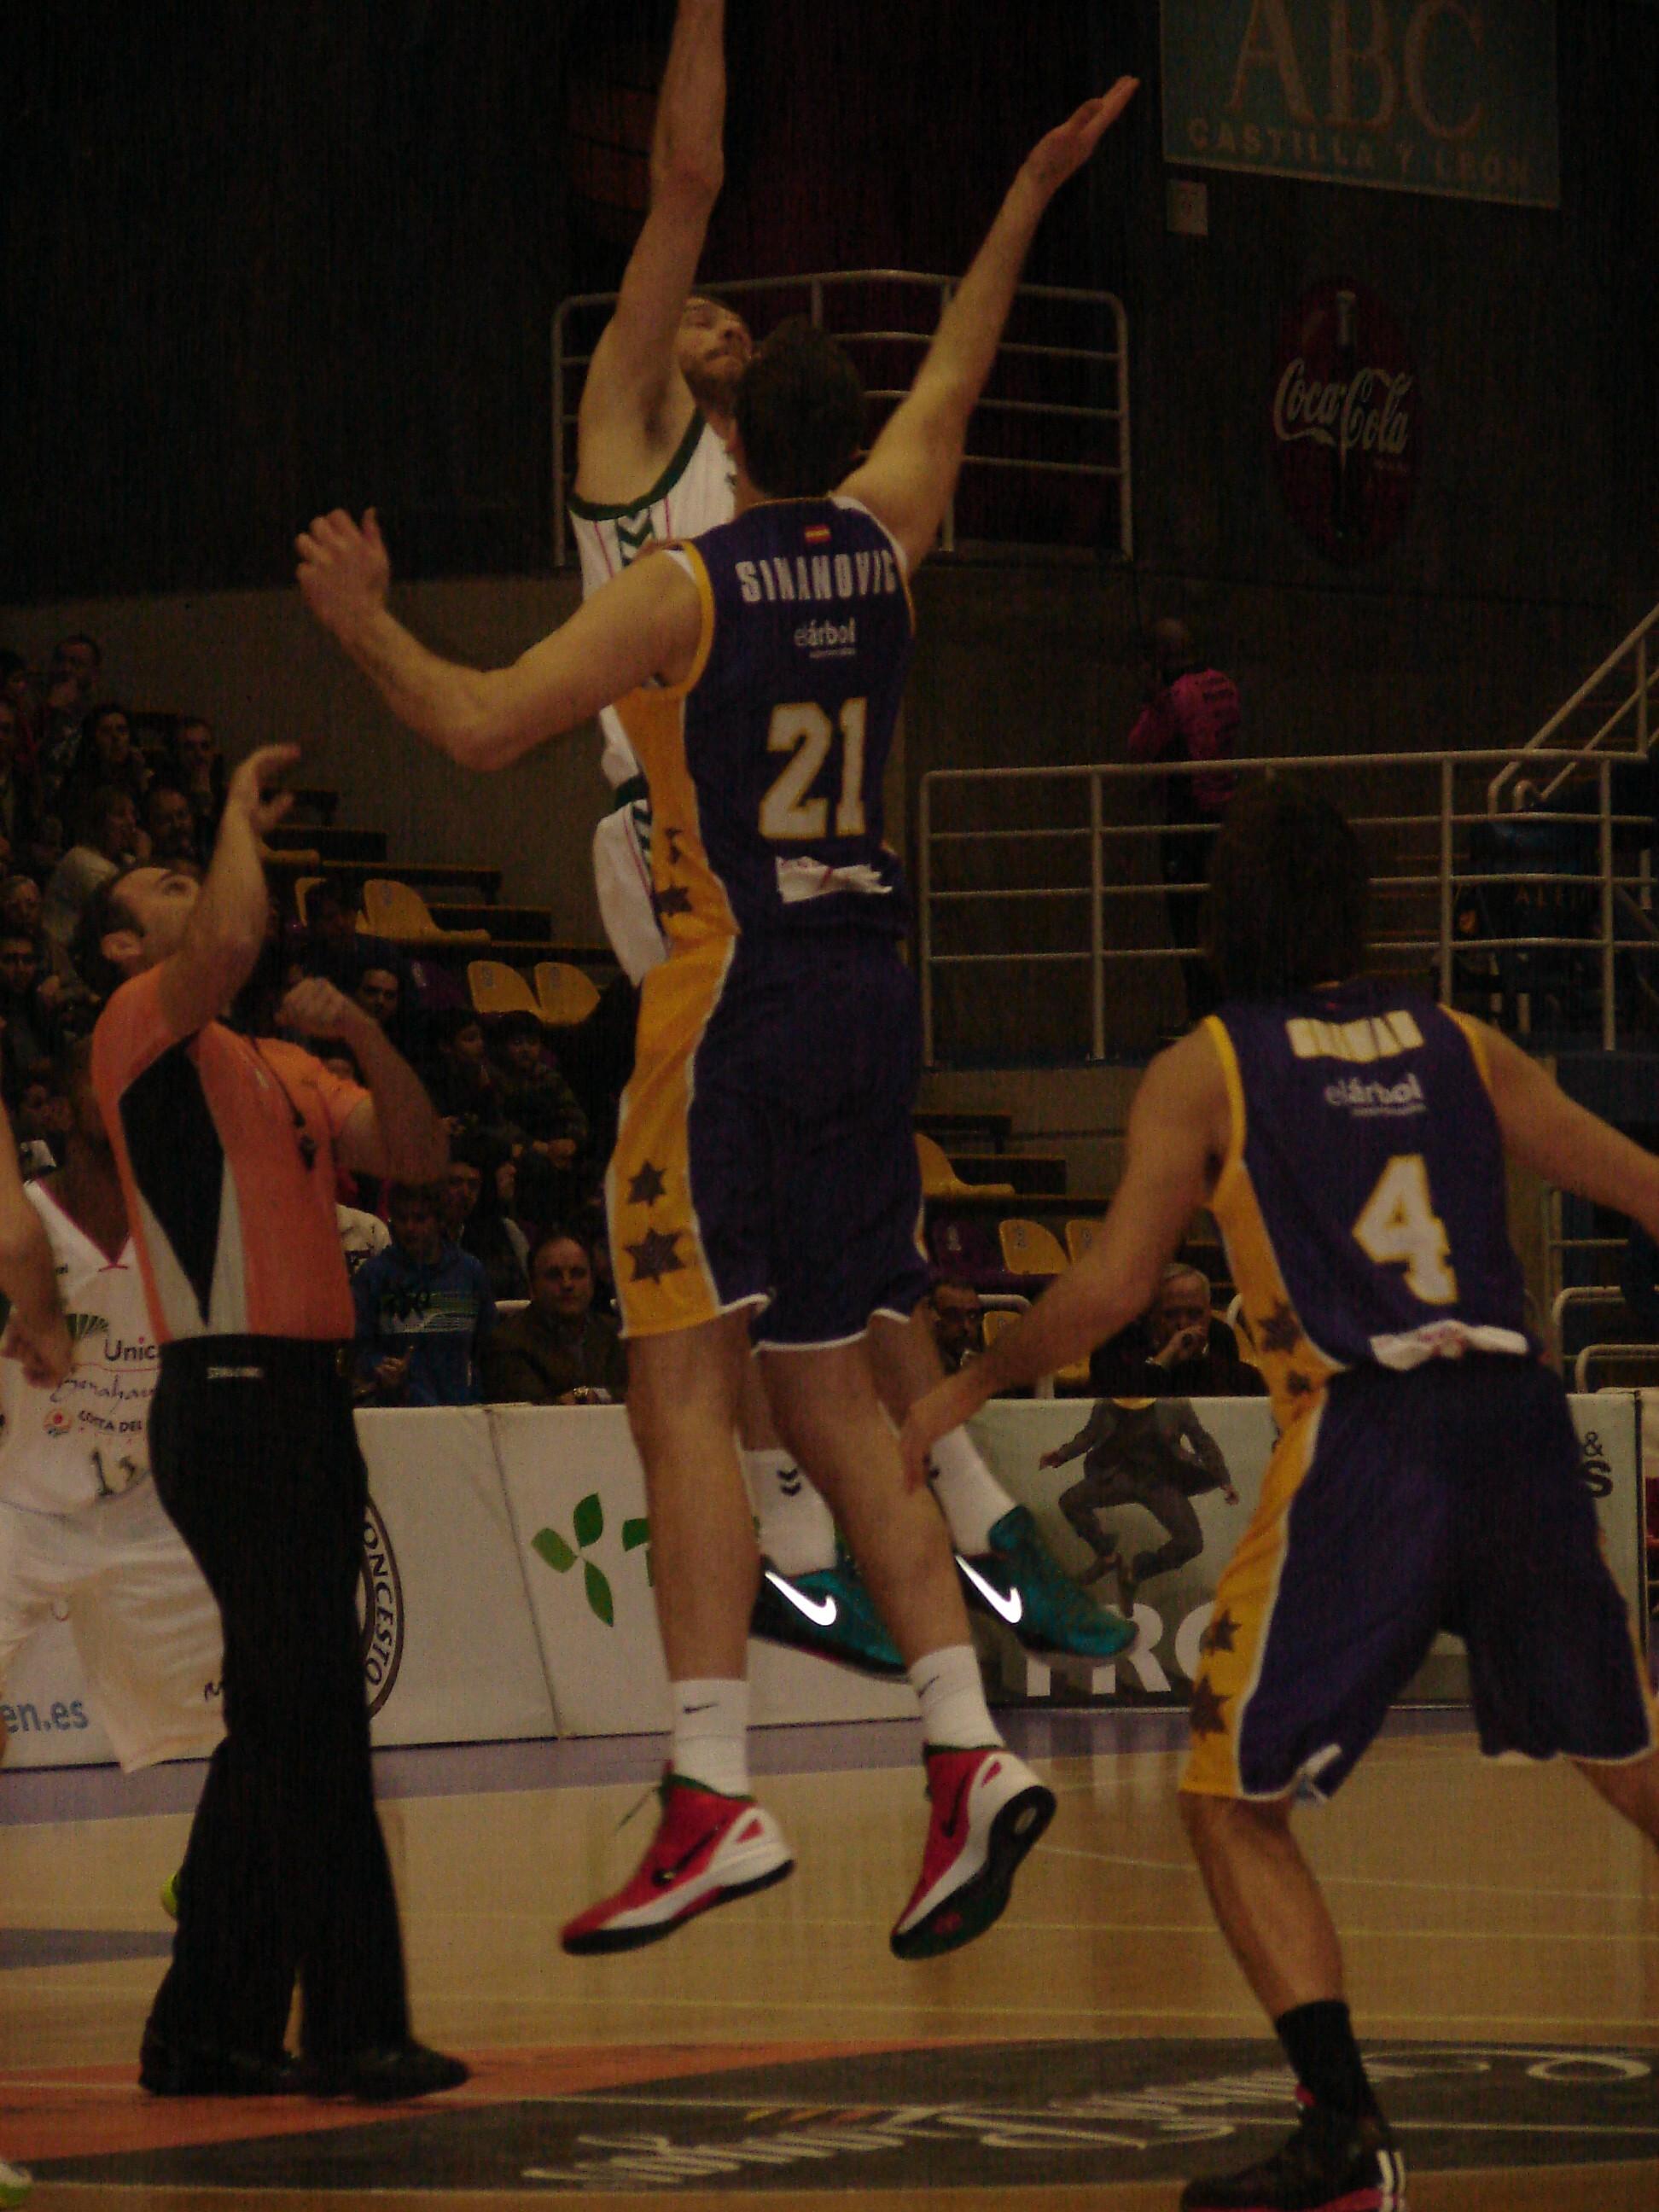 Salto inicial (Foto: Jose Navas)